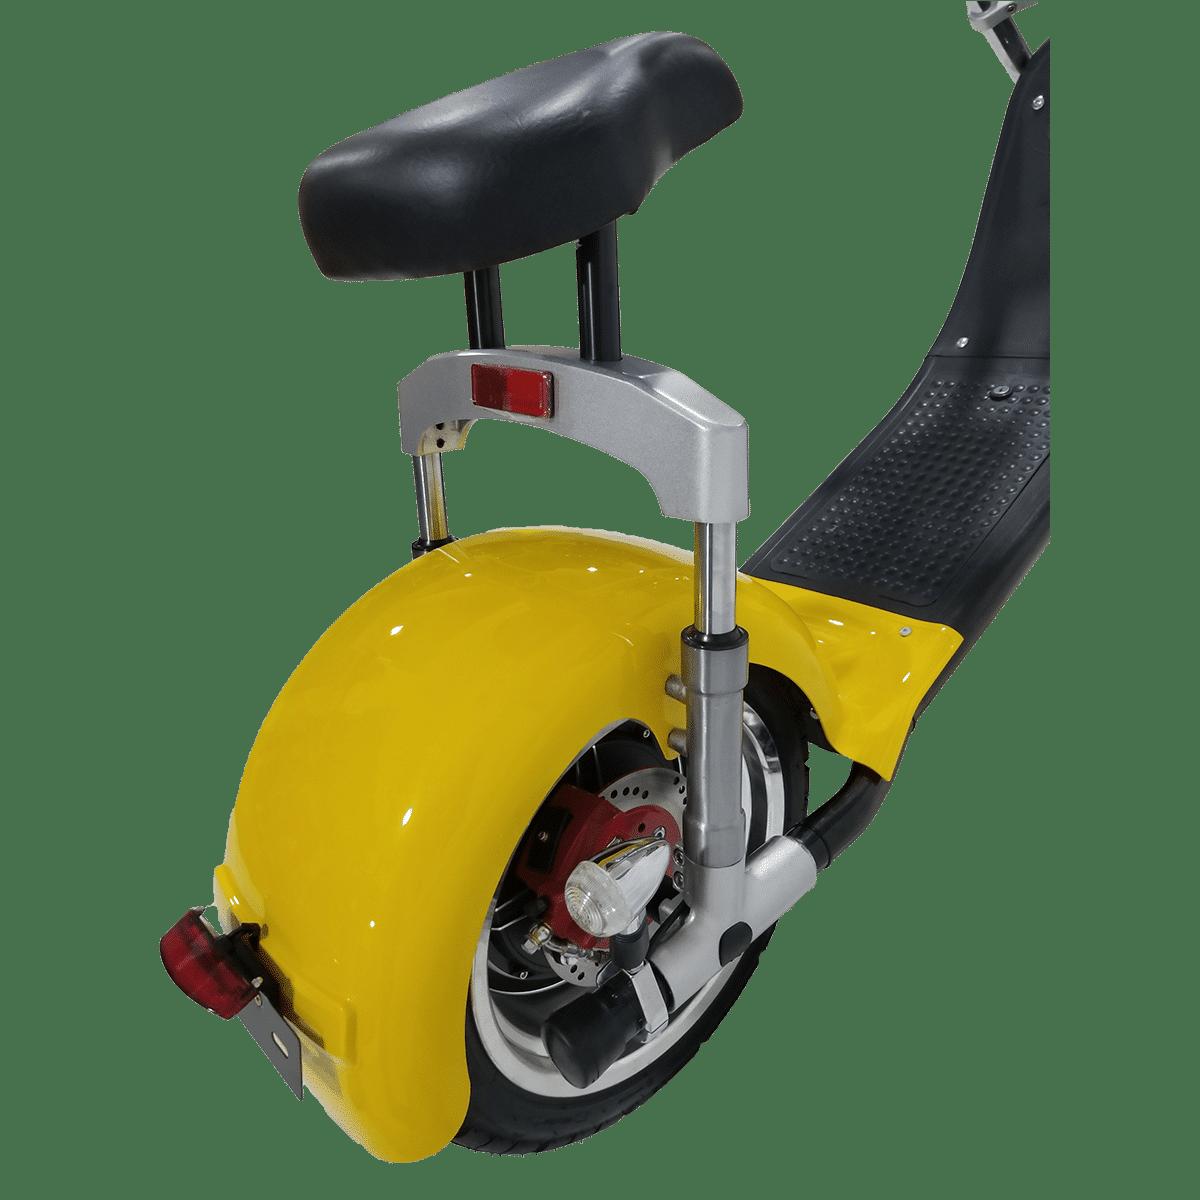 Citycoco Harley Deluxe Jaune avec 1 batterie offerte en plus 26